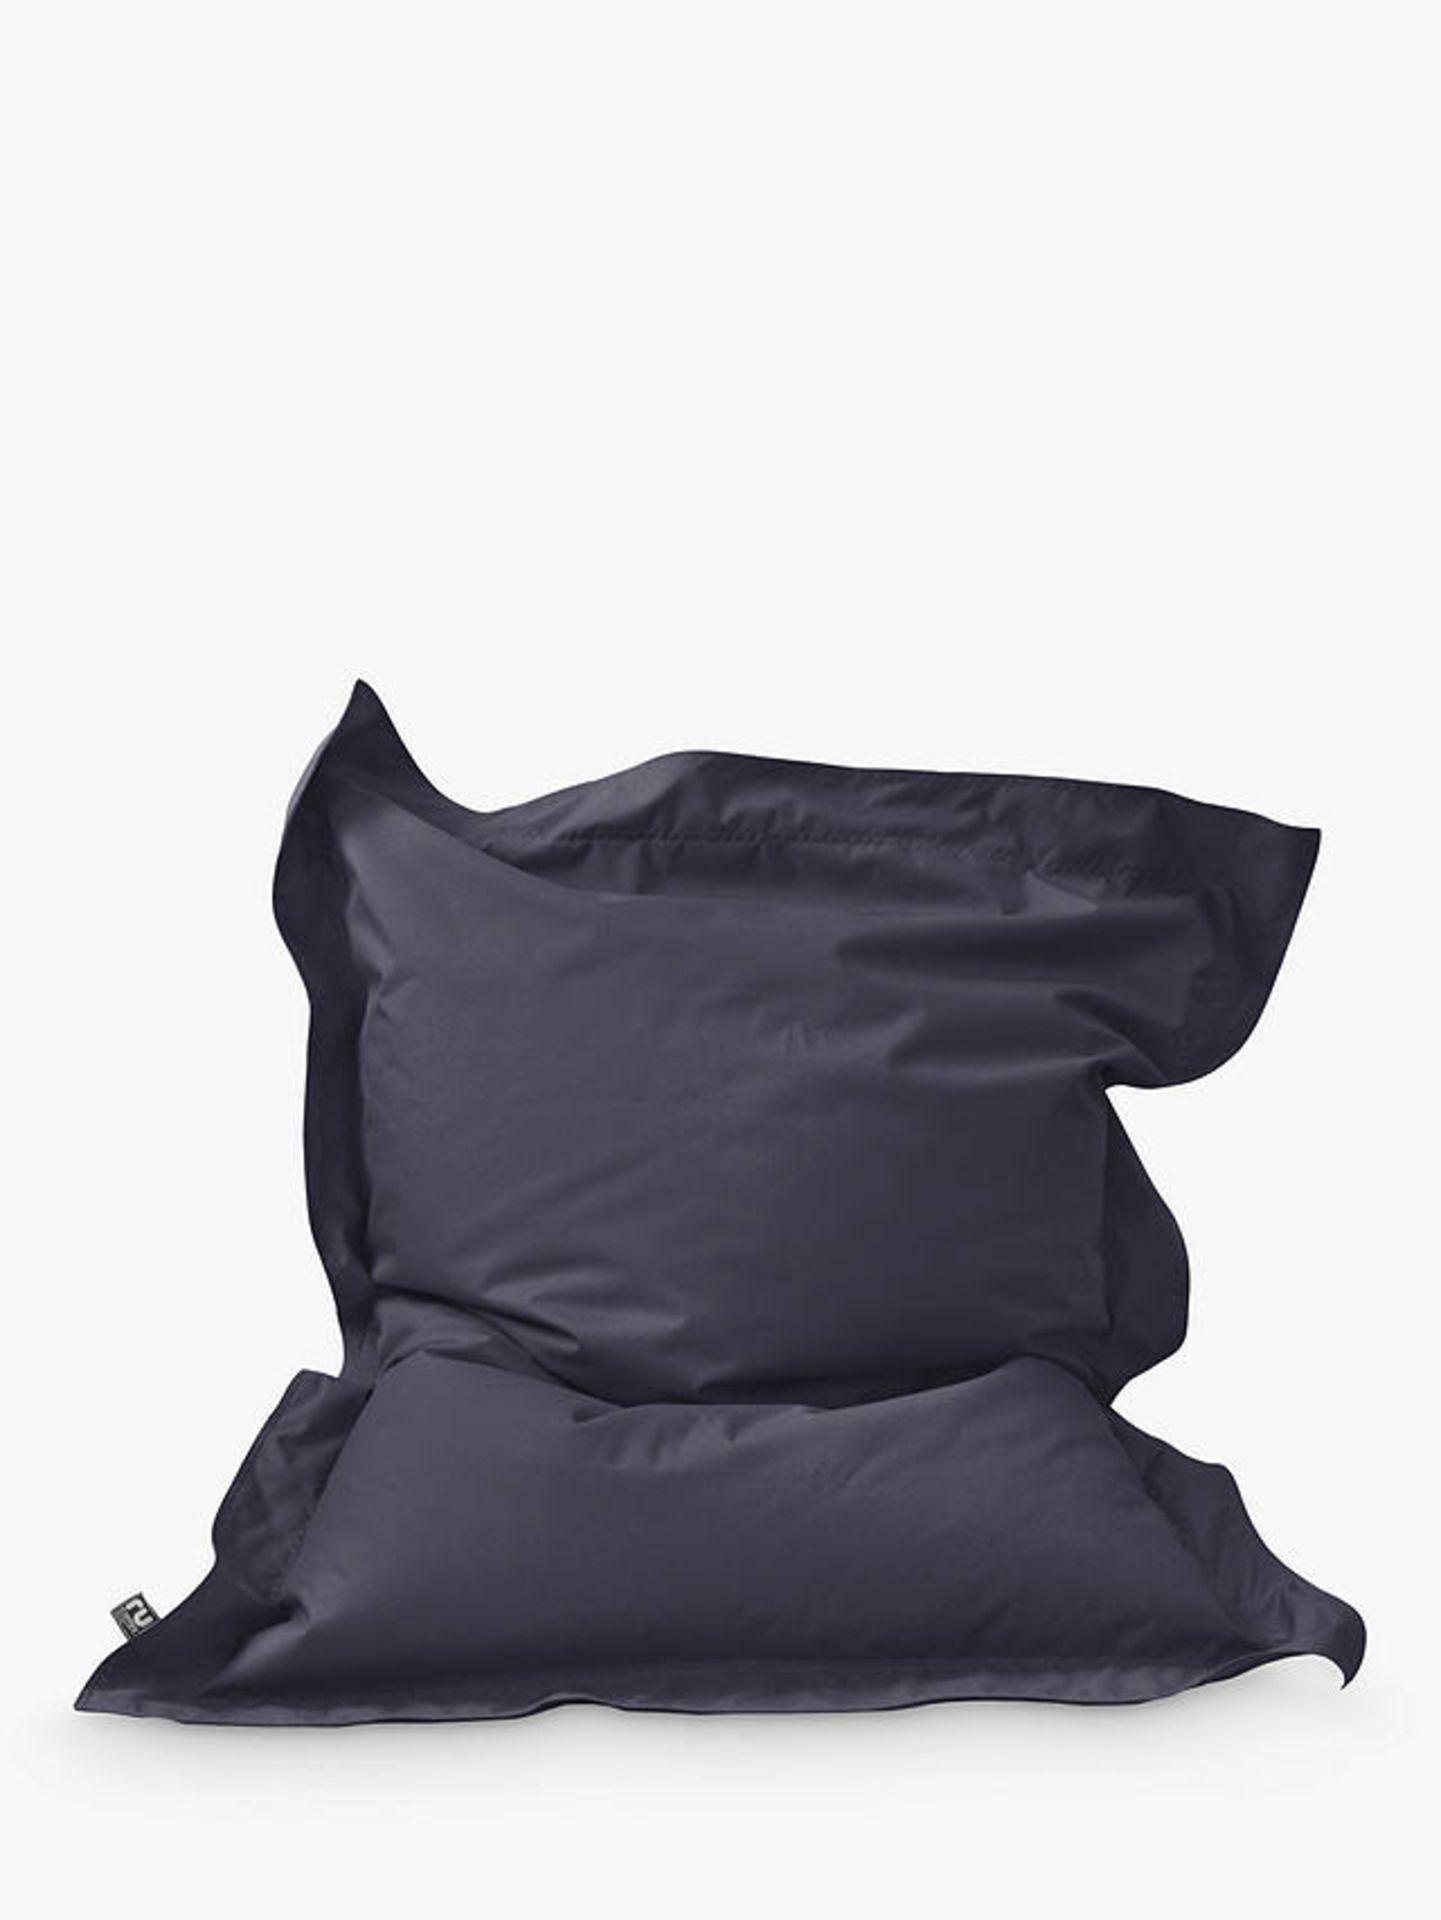 Rucomfy Junior Squashy Squarbie Indoor/ Outdoor Bean Bag navy